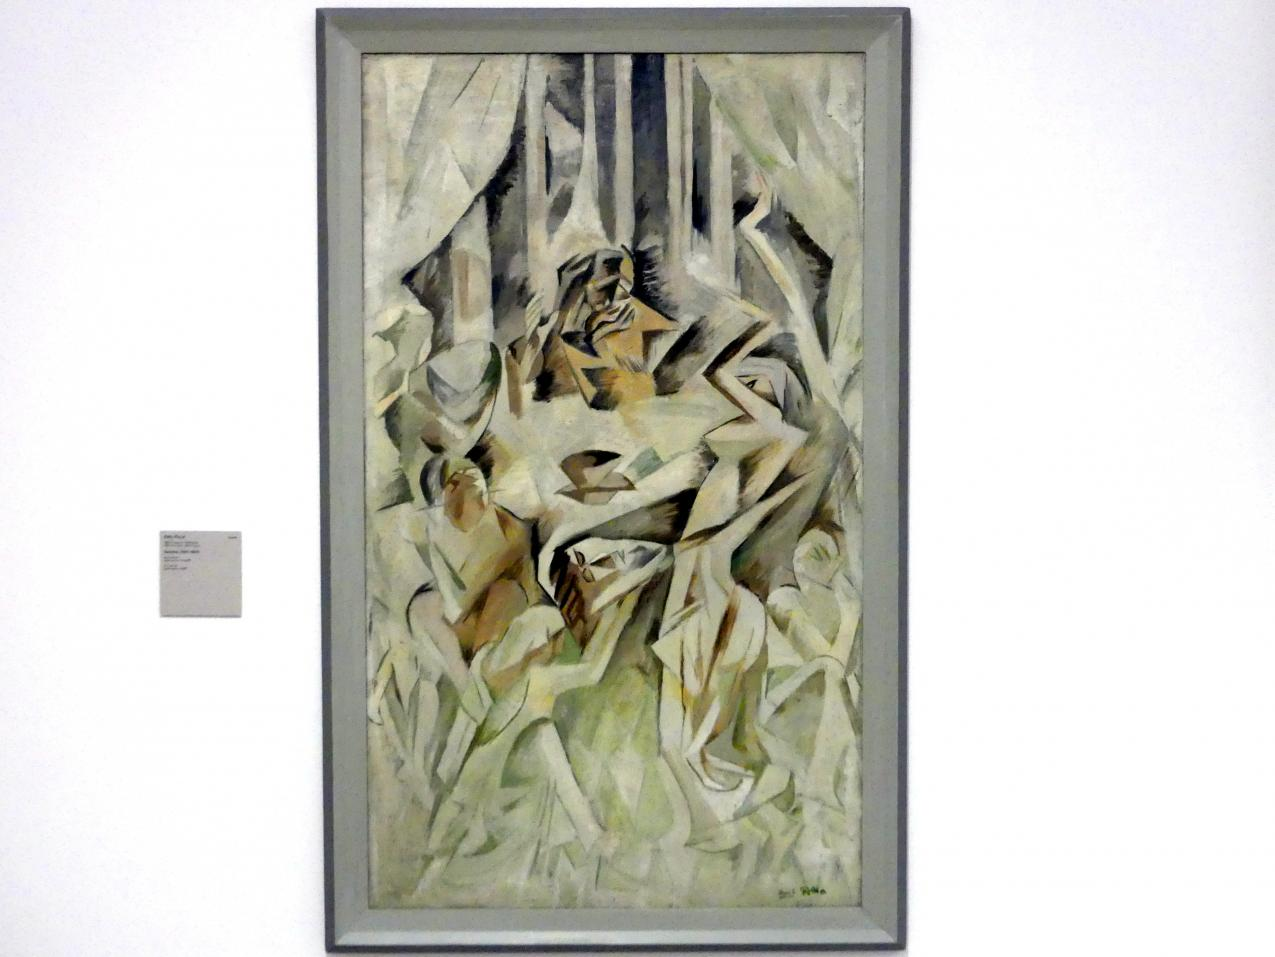 Emil Filla: Salome, 1911 - 1912